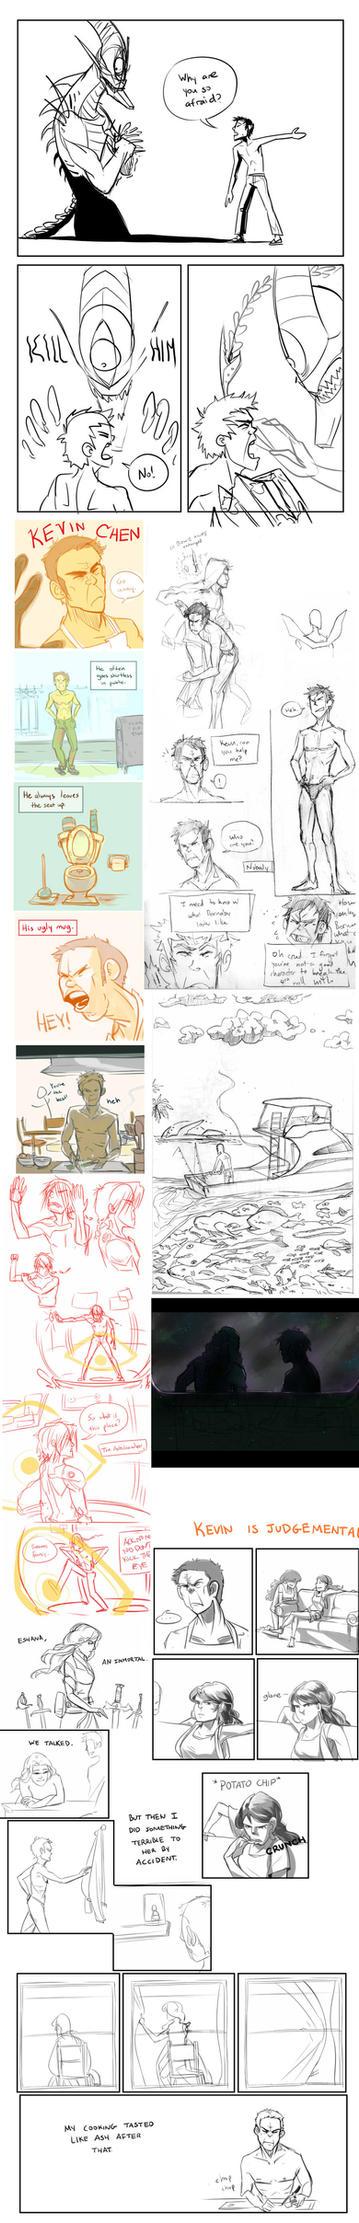 Kevin Sketchdump 2 by fishy-kun